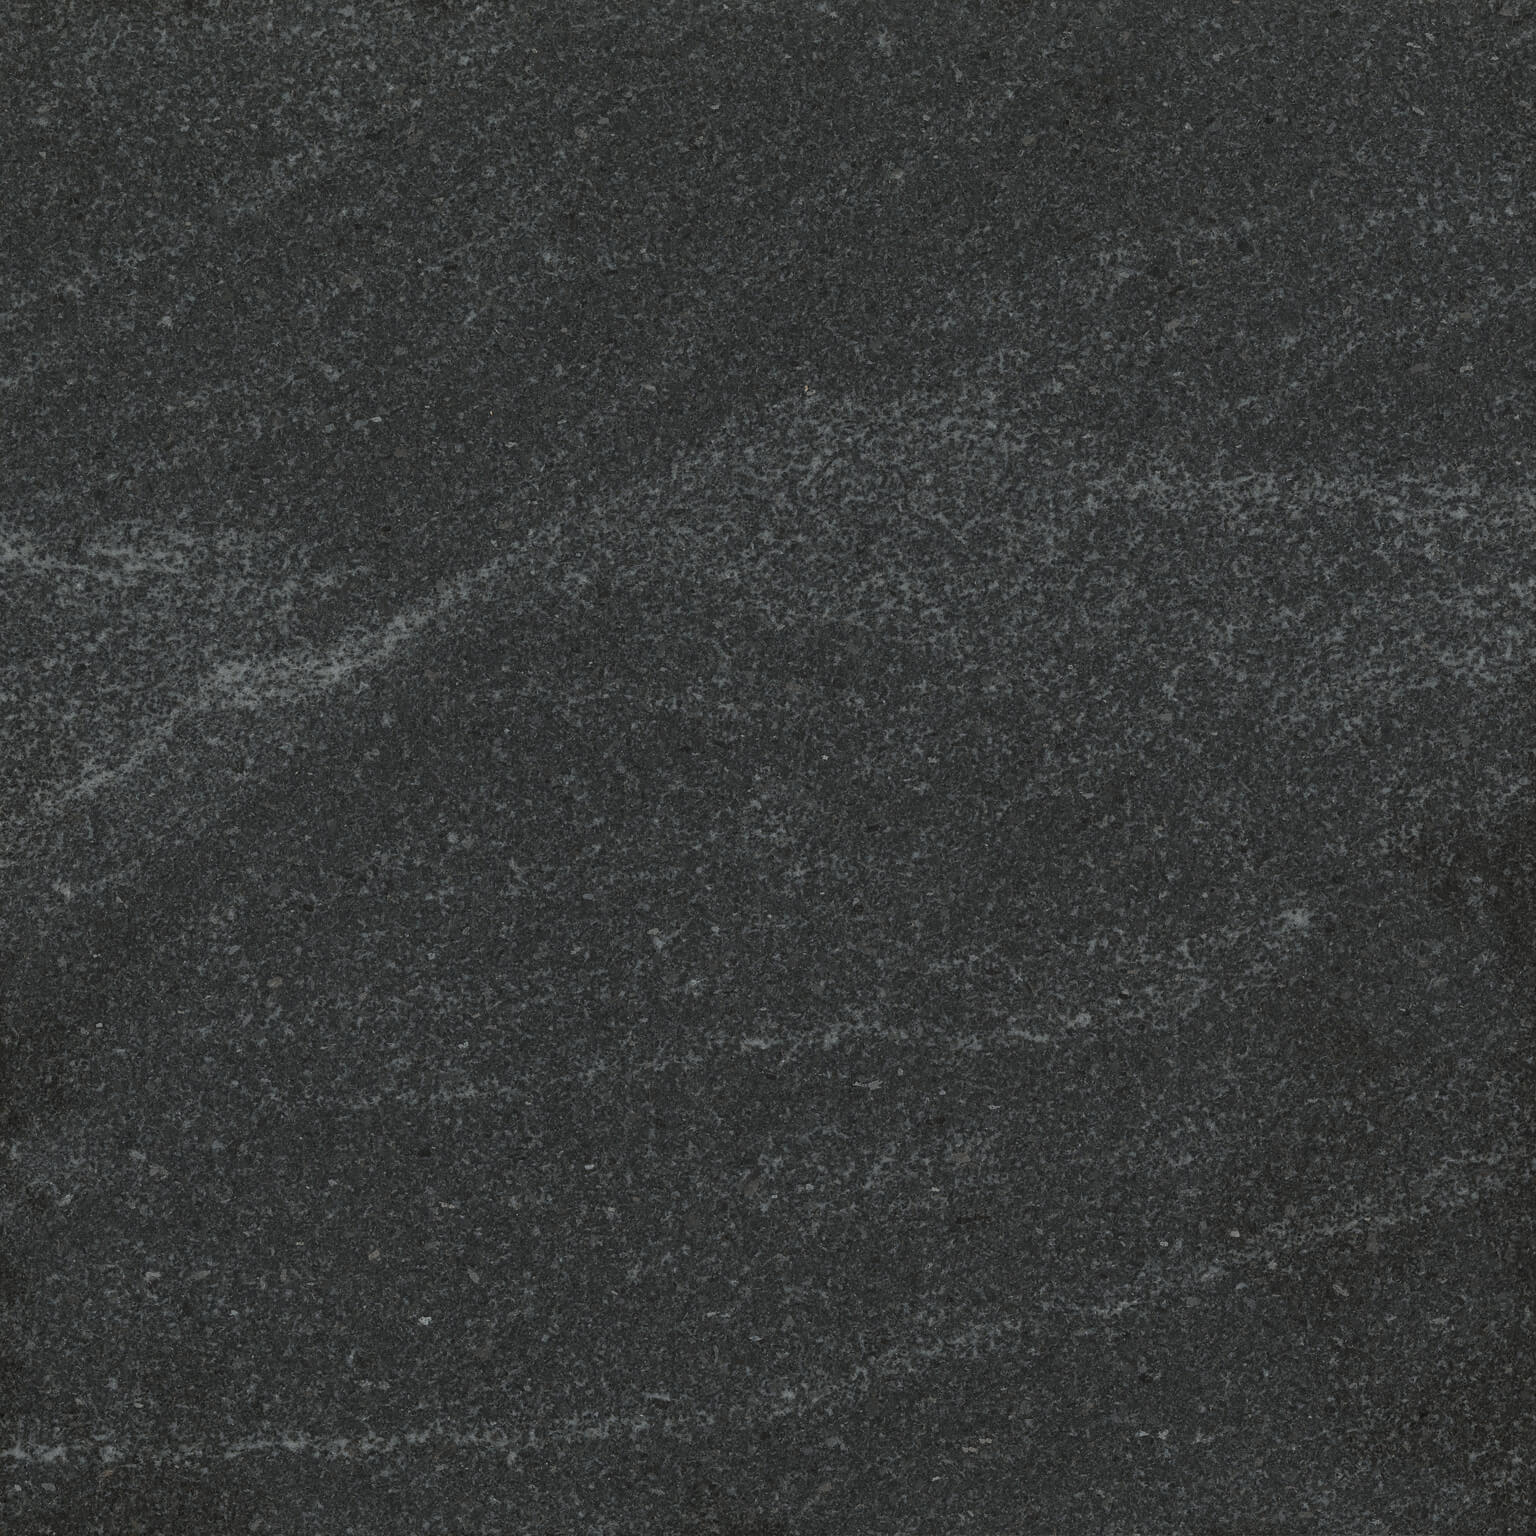 American Black Marble Trend Granite Tiles Toronto Ontario